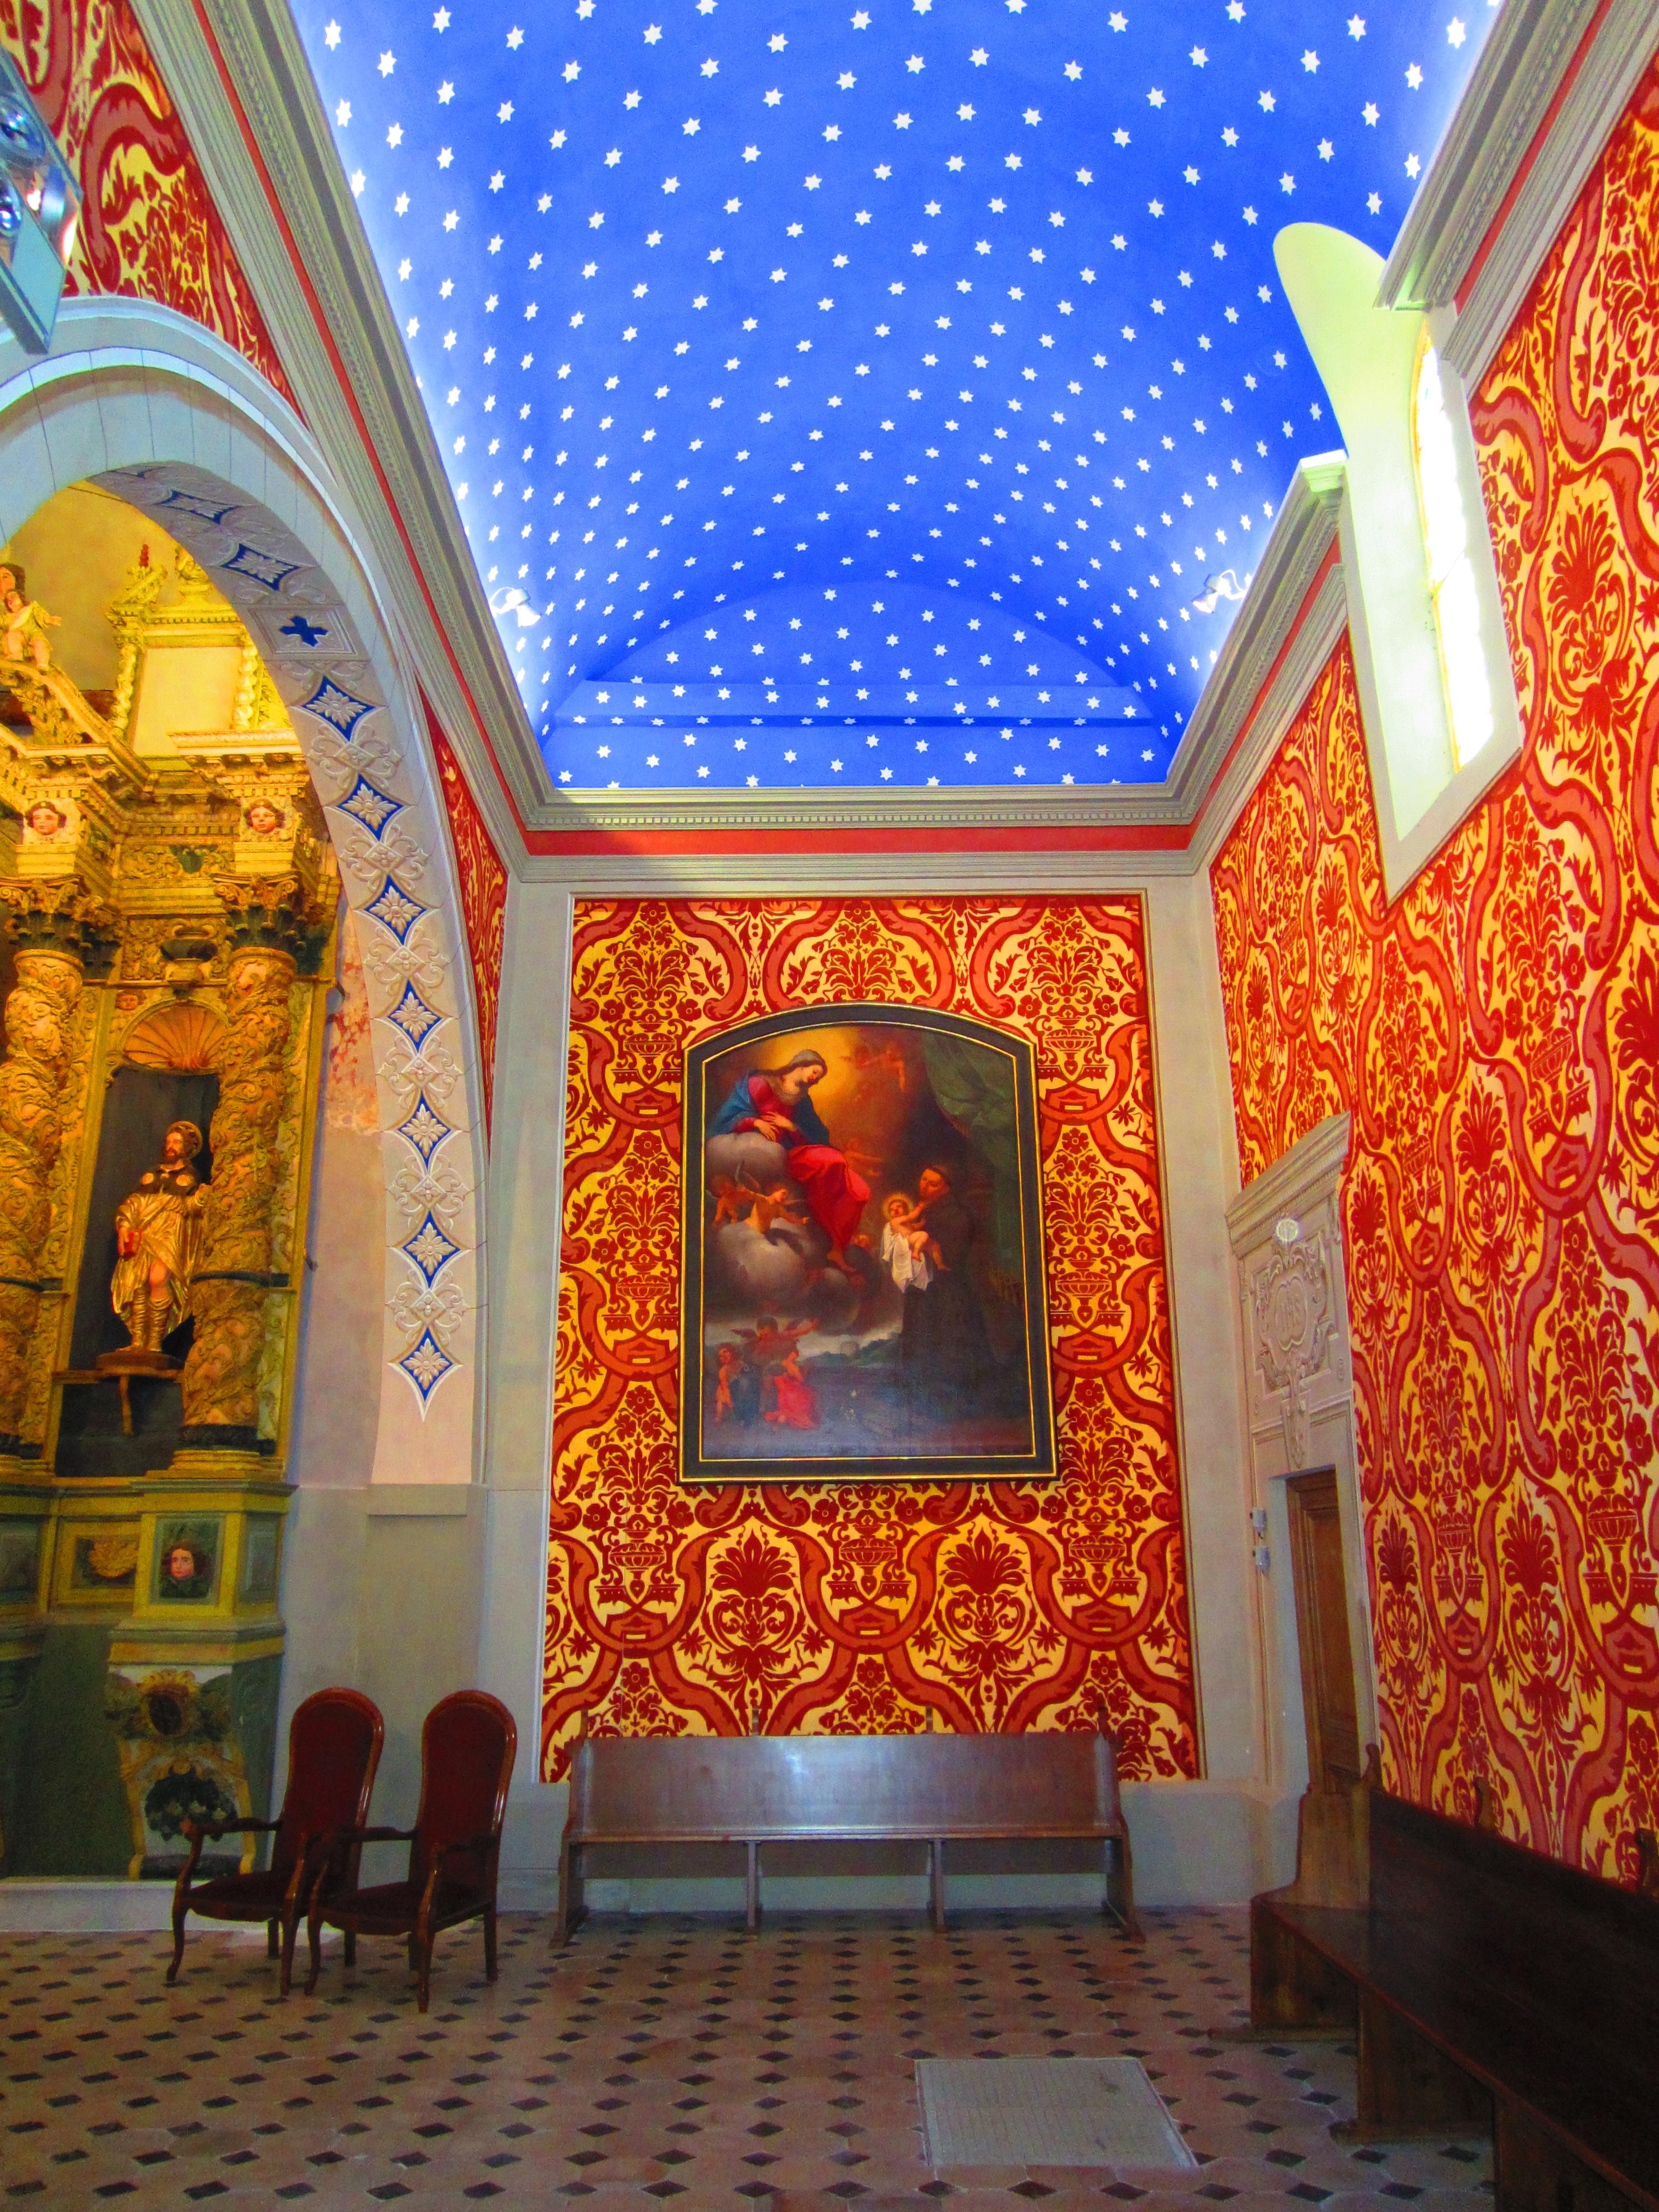 FileSt Bernardin Antibes plafond etoilejpg  Wikimedia